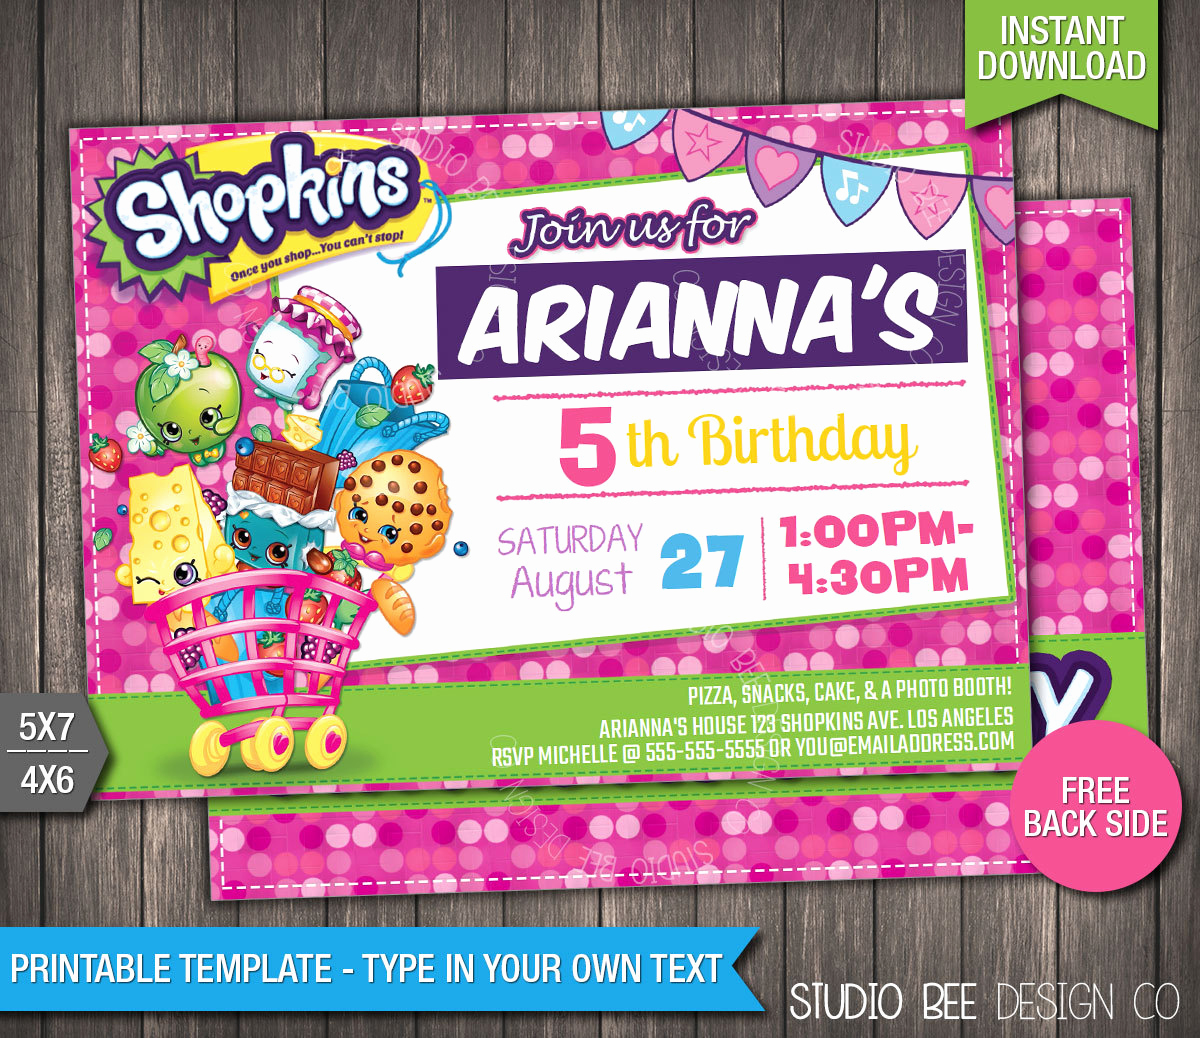 Shopkins Birthday Party Invitation Best Of Off Shopkins Birthday Invitation Instant by